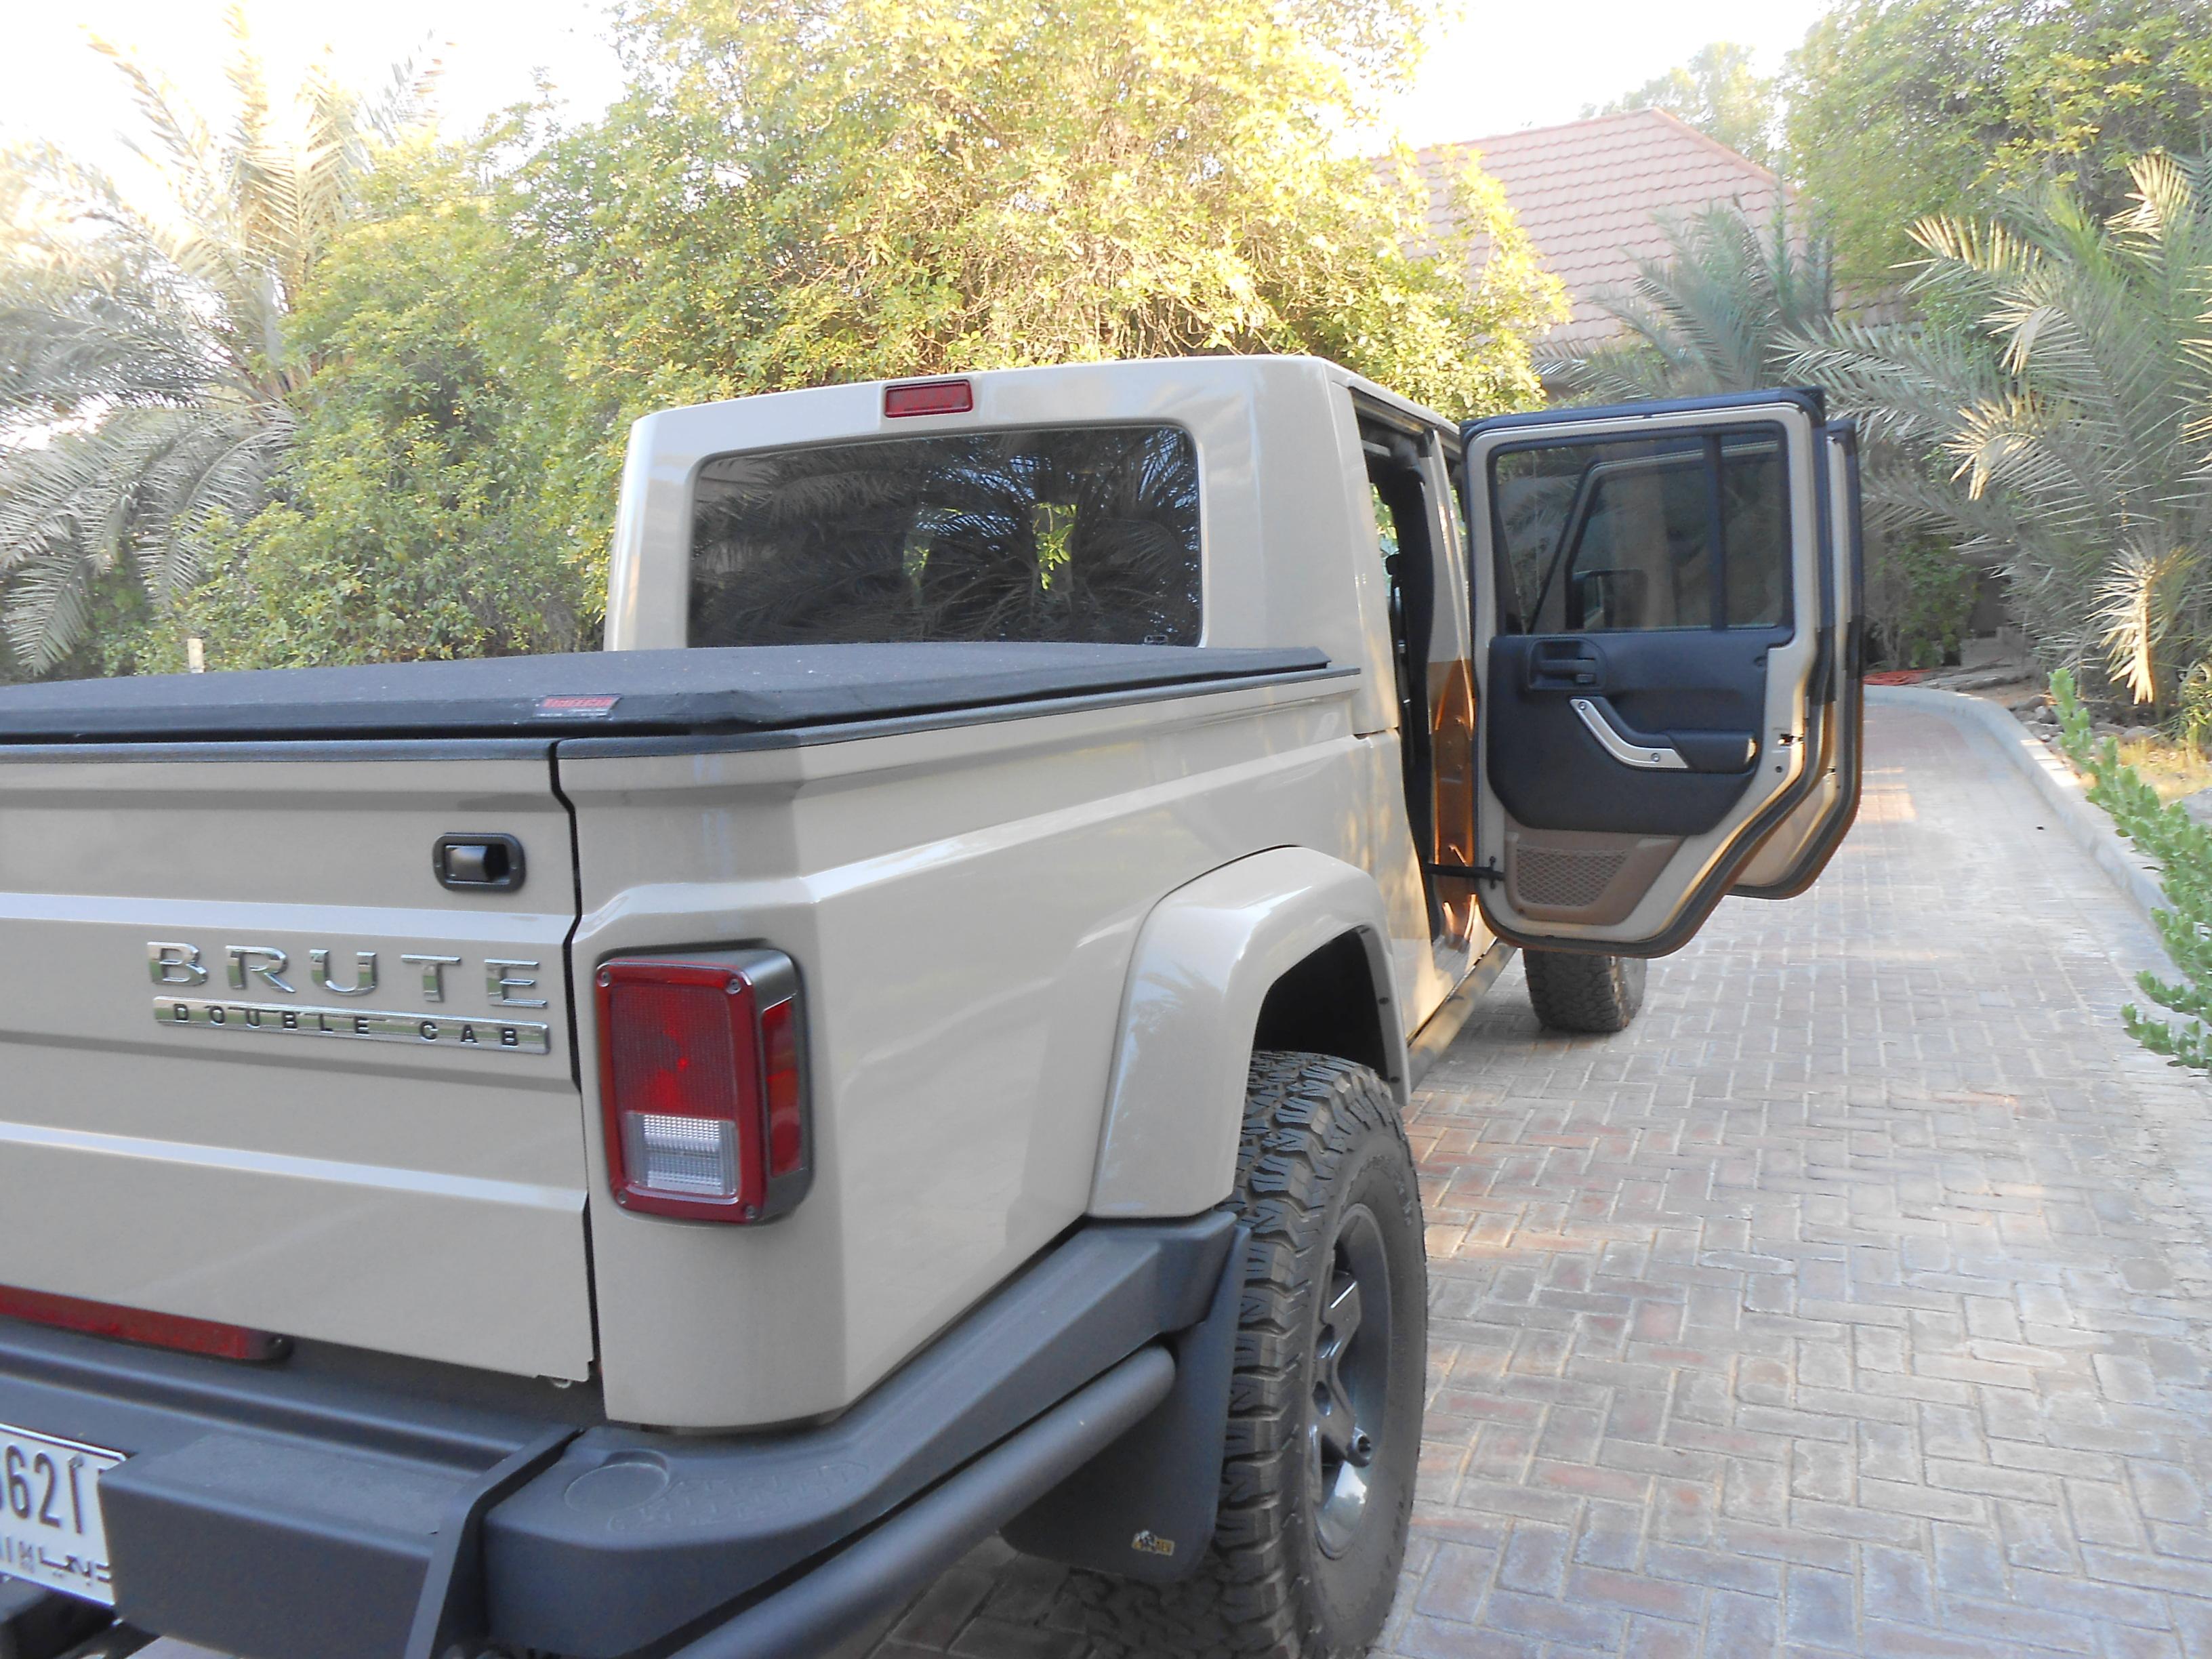 Jeep Wrangler 2016 Brute Double Cab